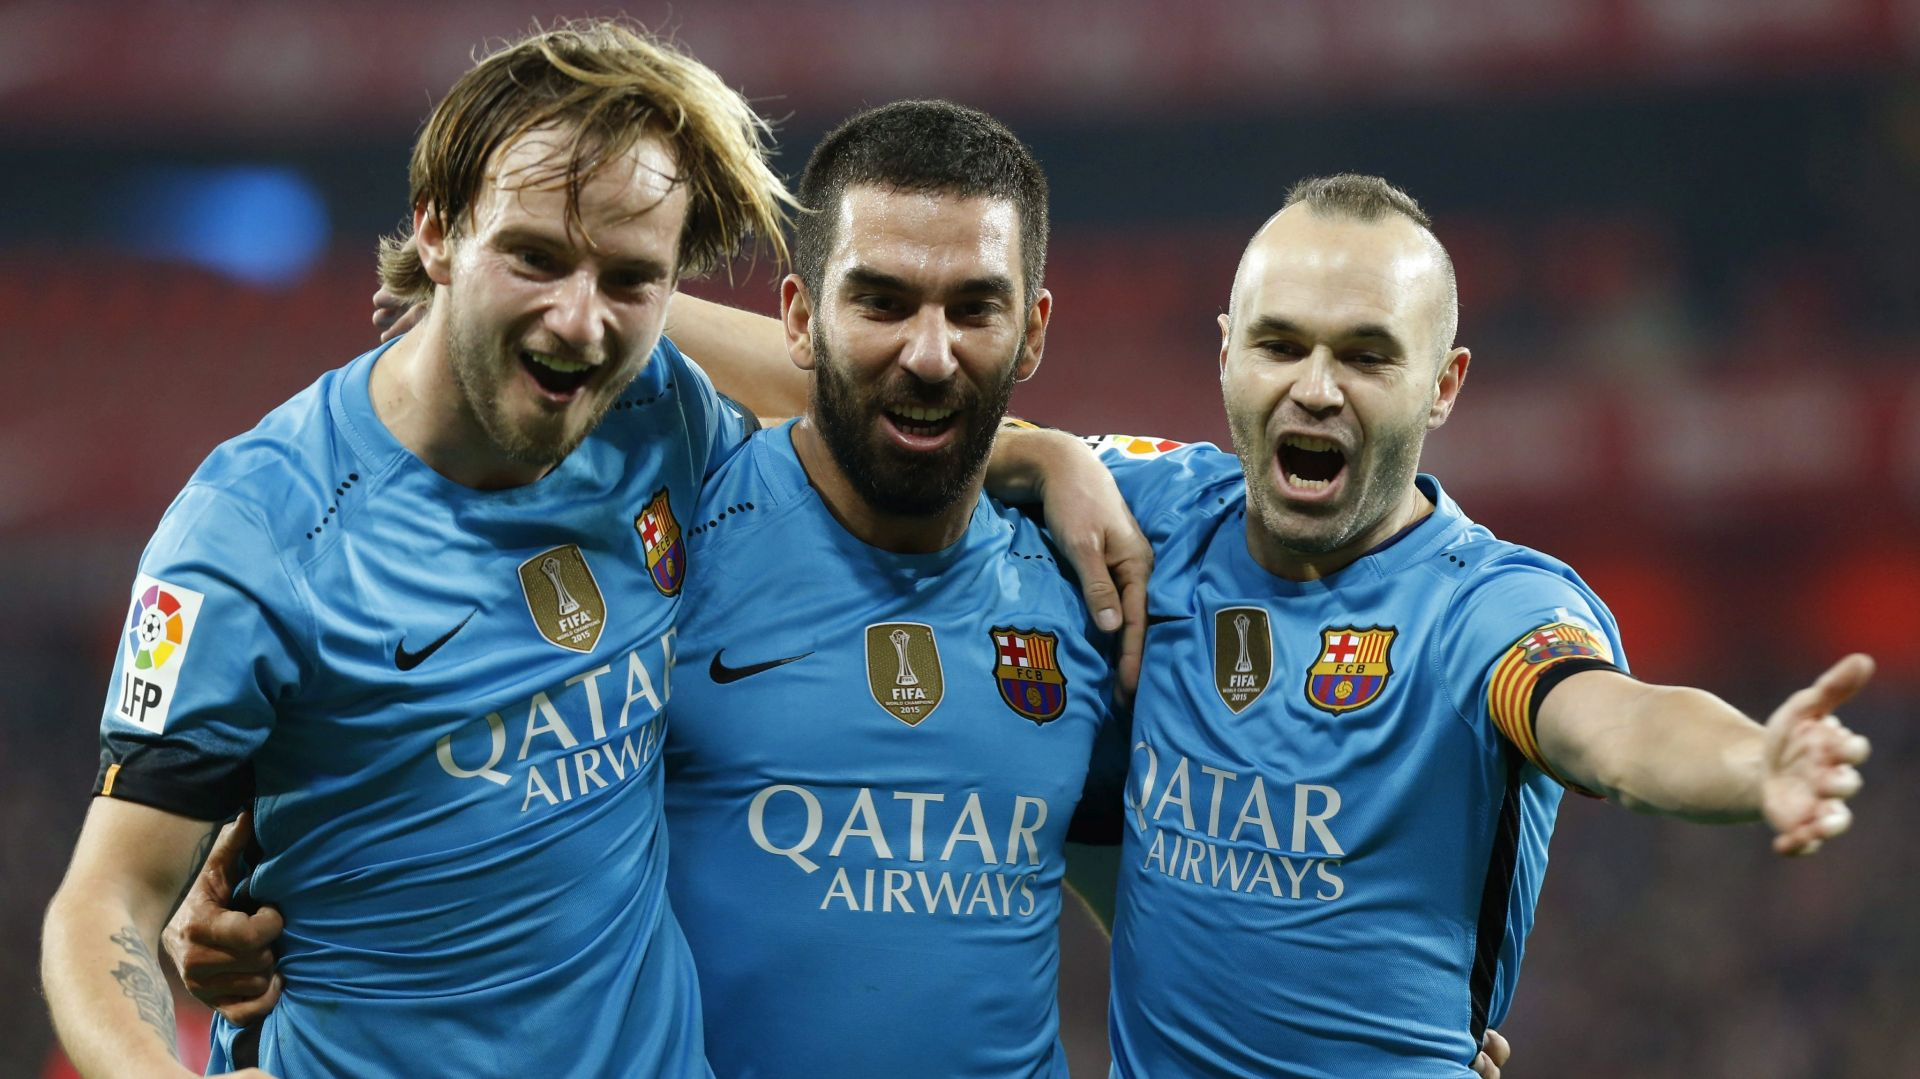 ŠPANJOLSKI KUP KRALJA Valencia na Barcelonu, Celta protiv Seville